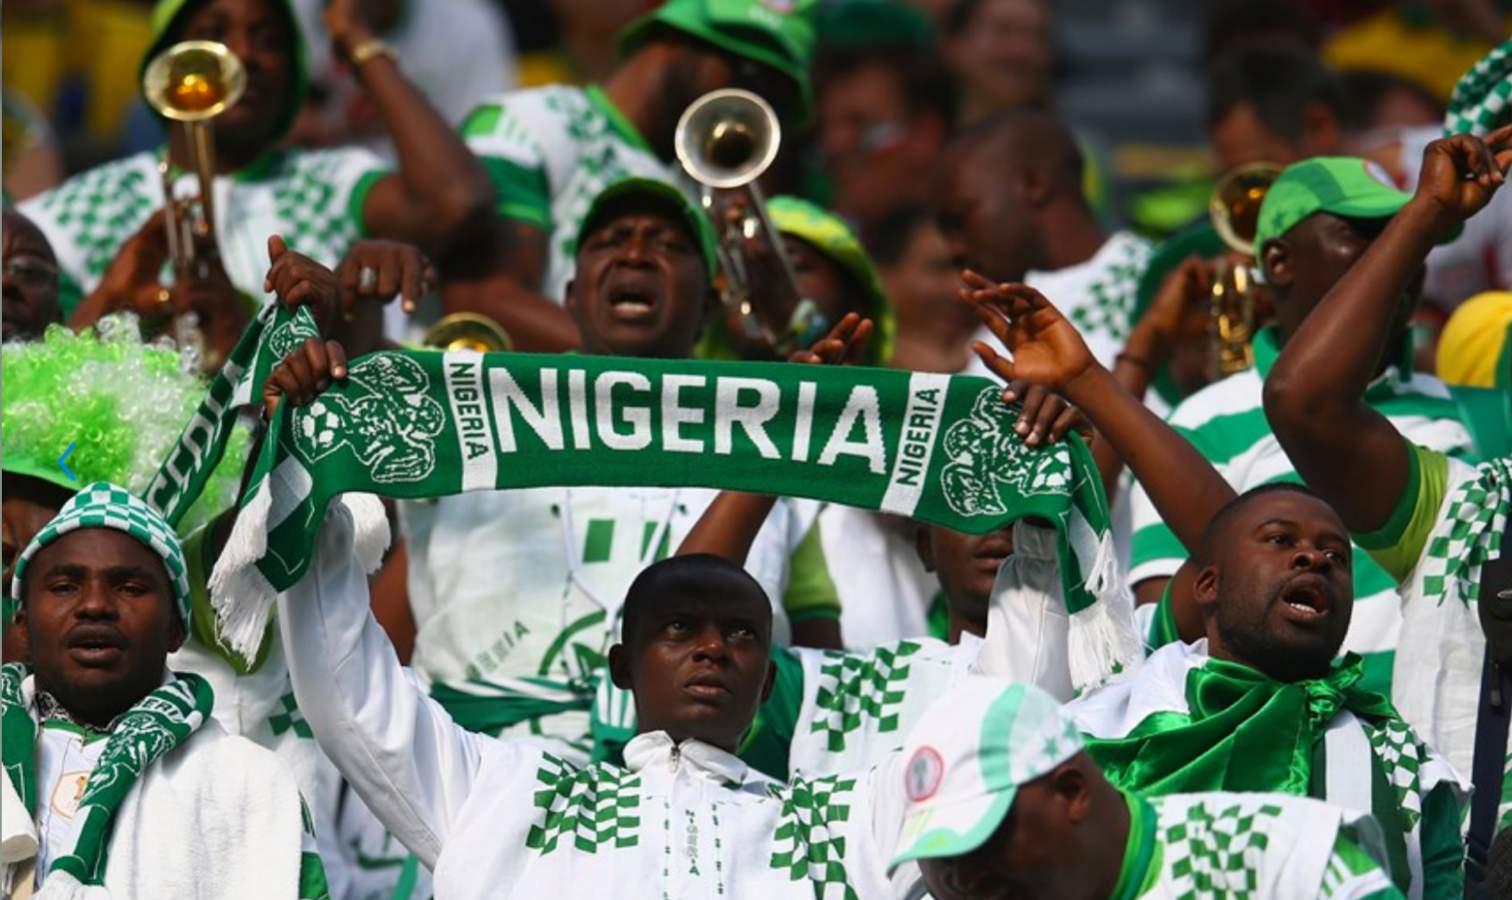 nigeria supporters public